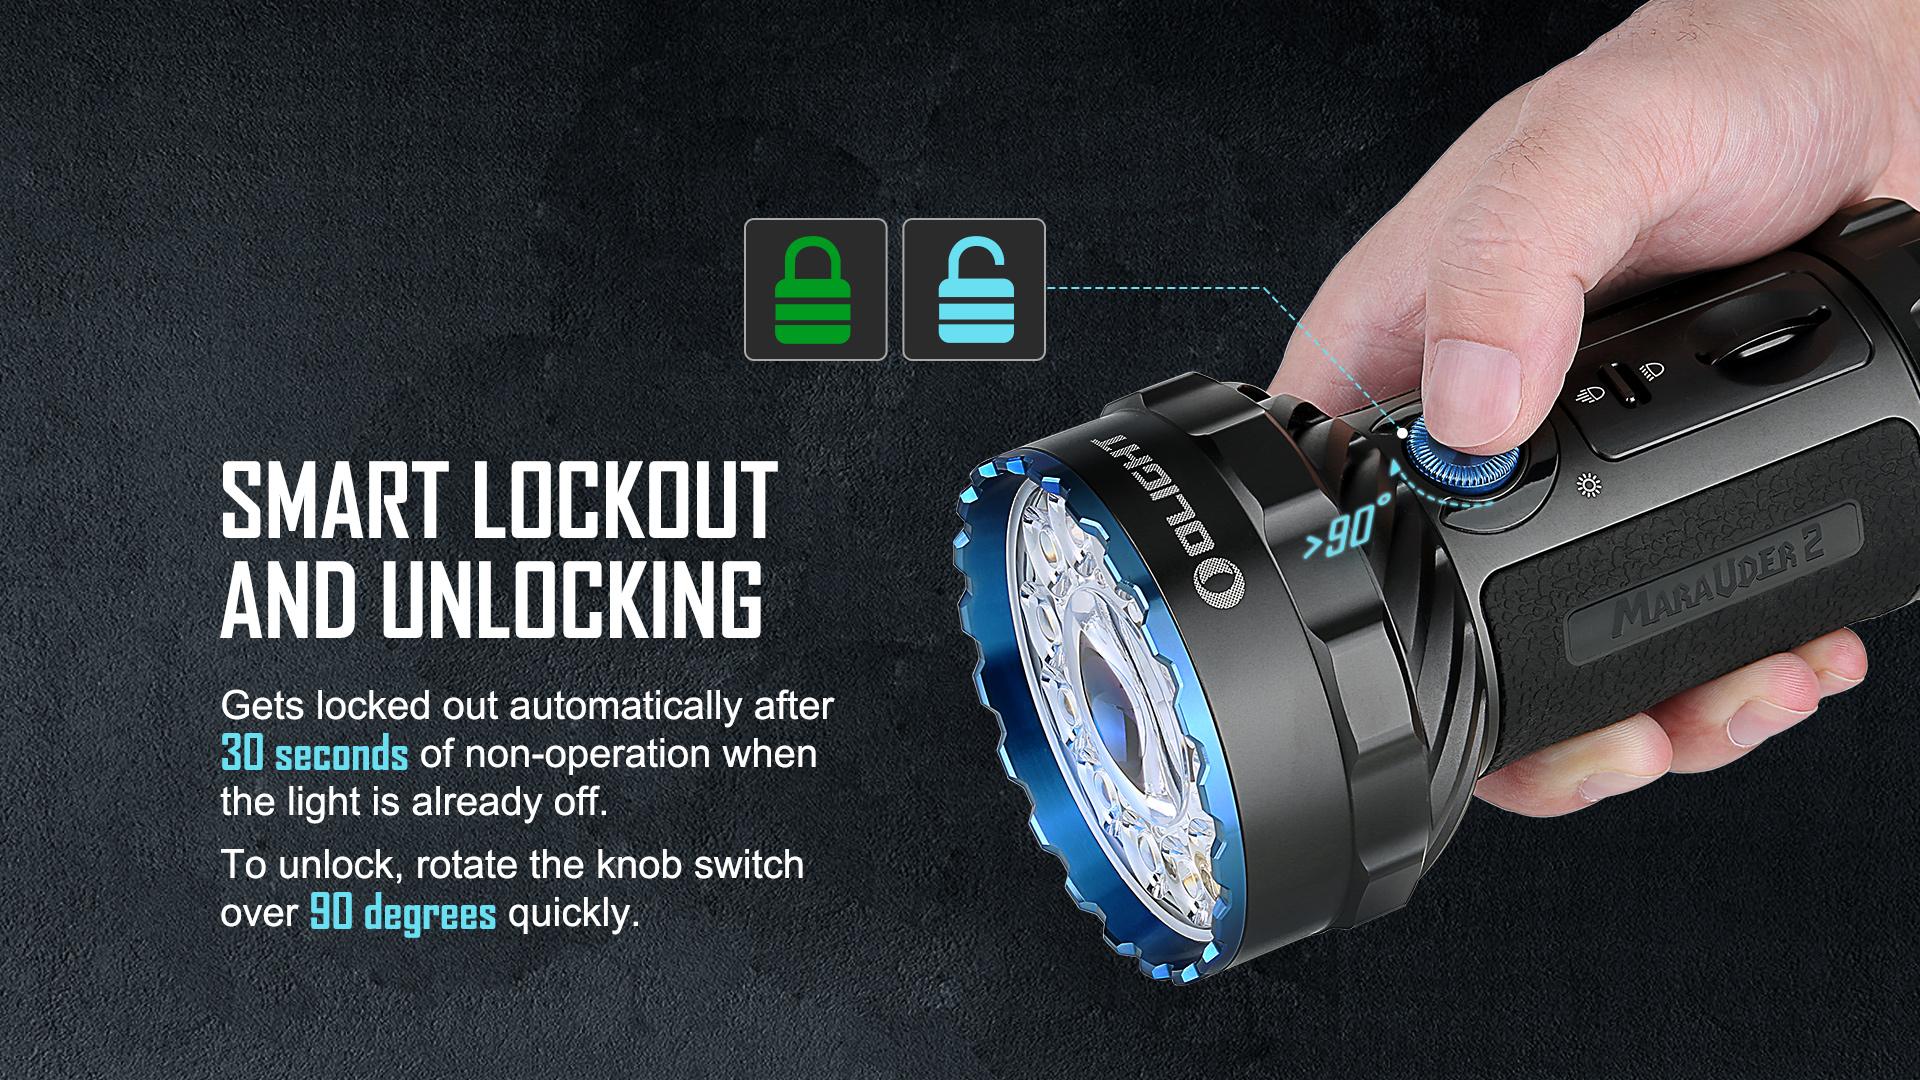 Olight Marauder 2 Most Powerful Flashlight Smart Lockout & Unlocking